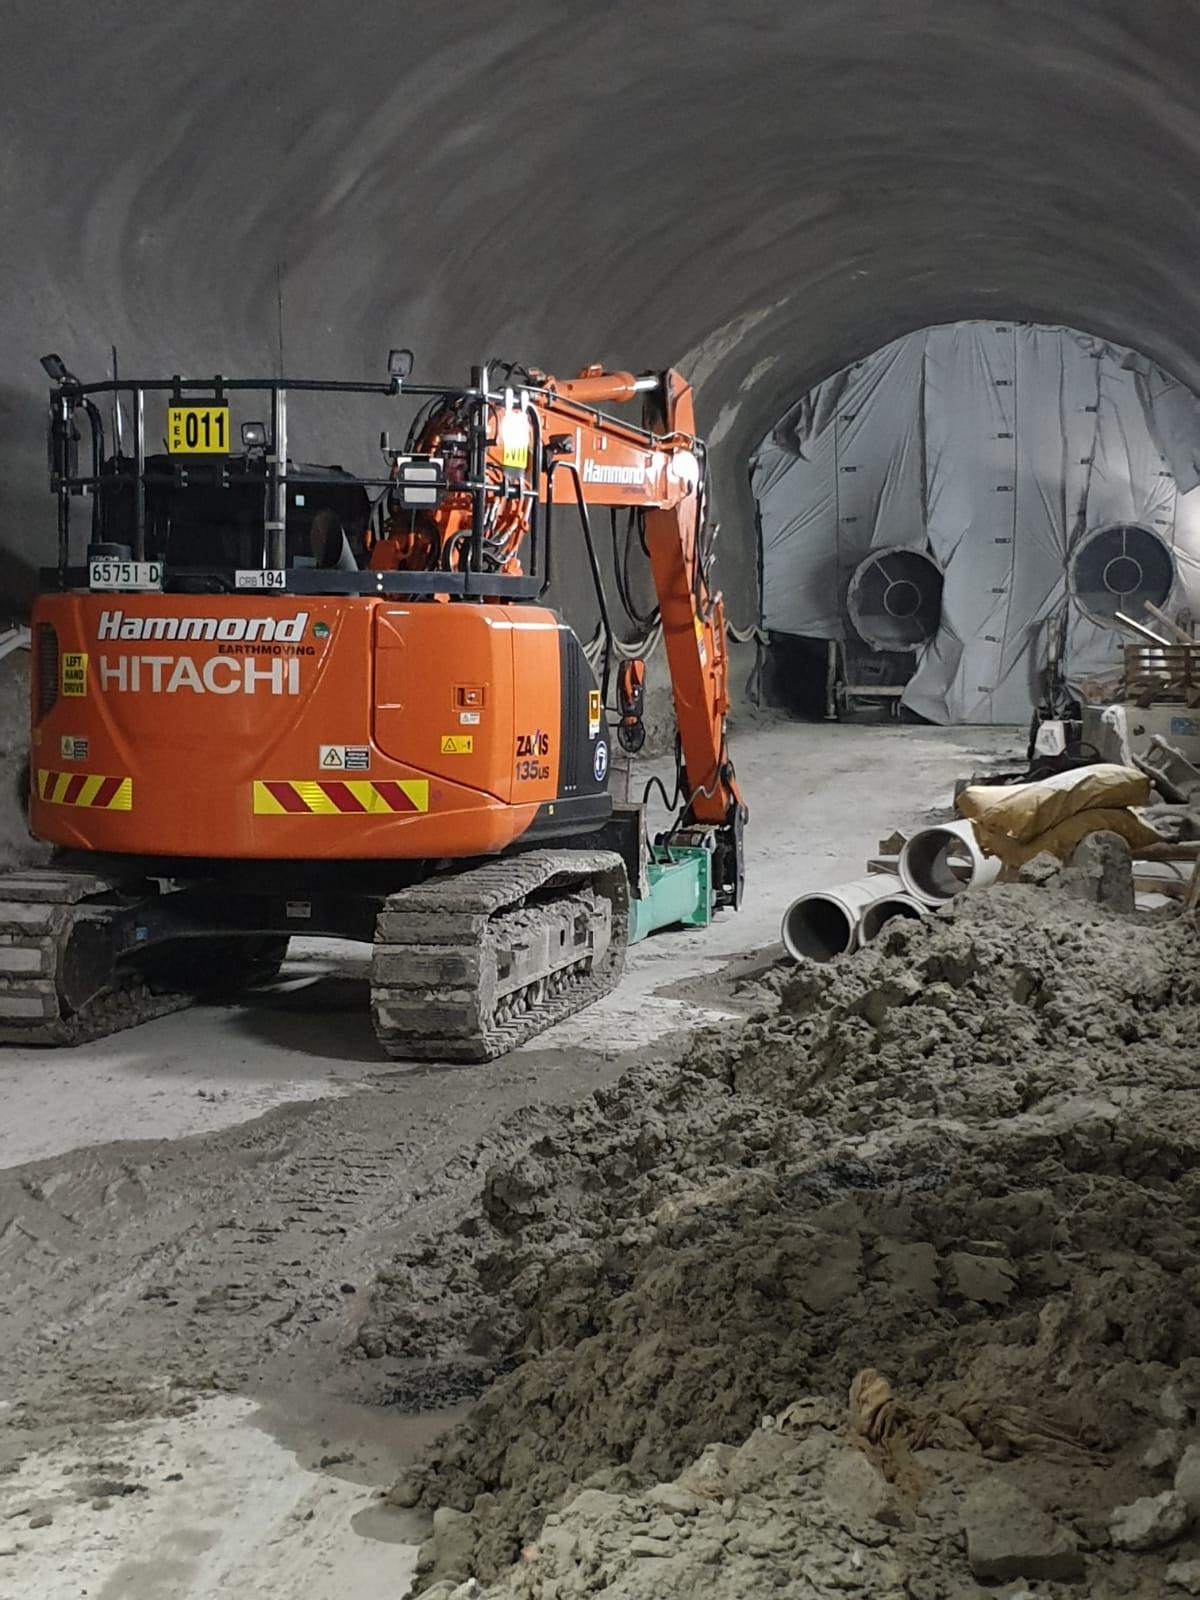 hammond-earthmoving-excavators-for-rent-brisbane